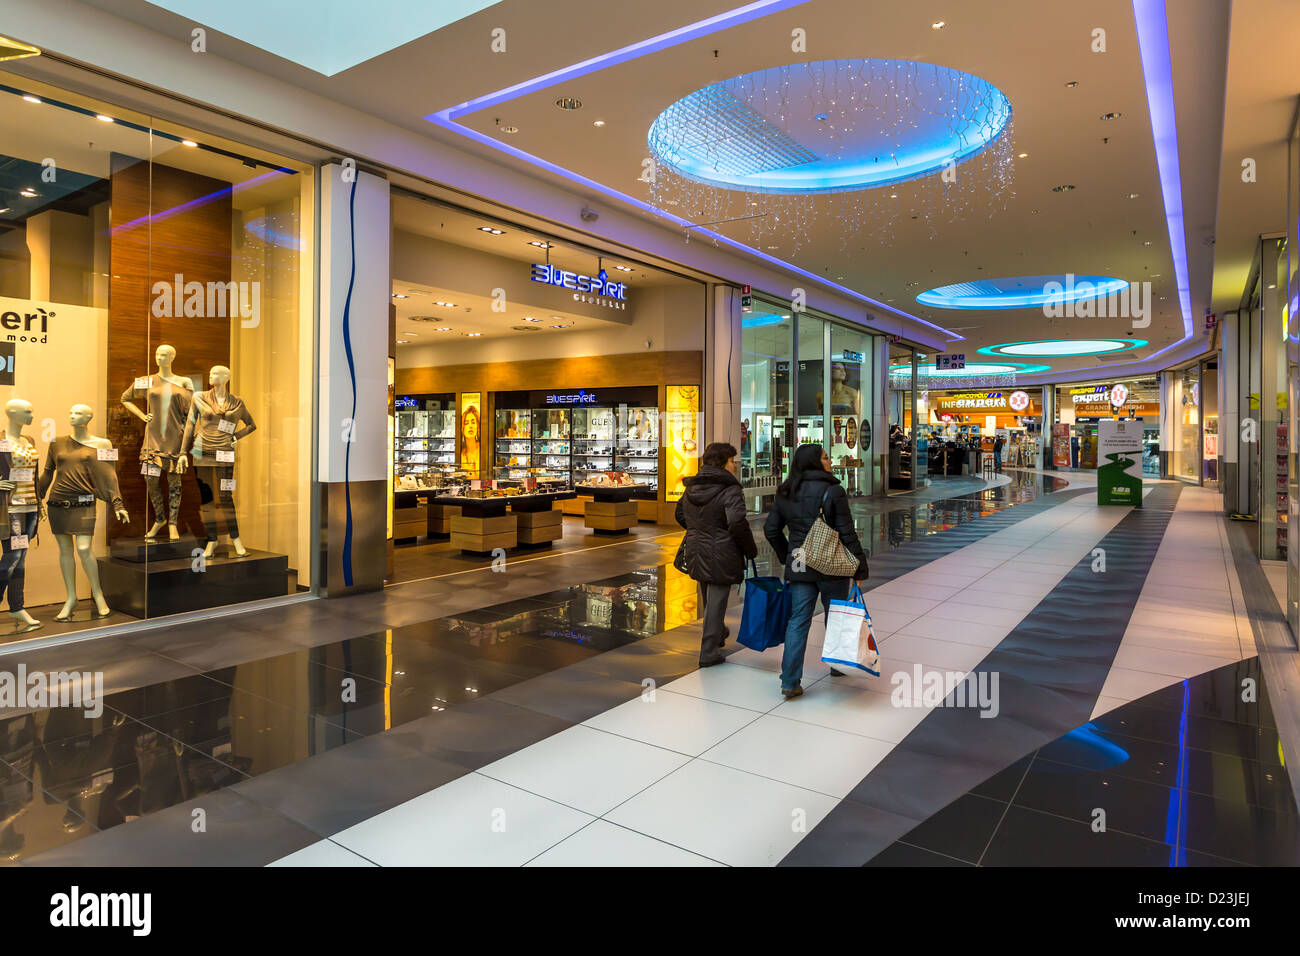 Parma Eurosia shopping mall, Parma, - Stock Image